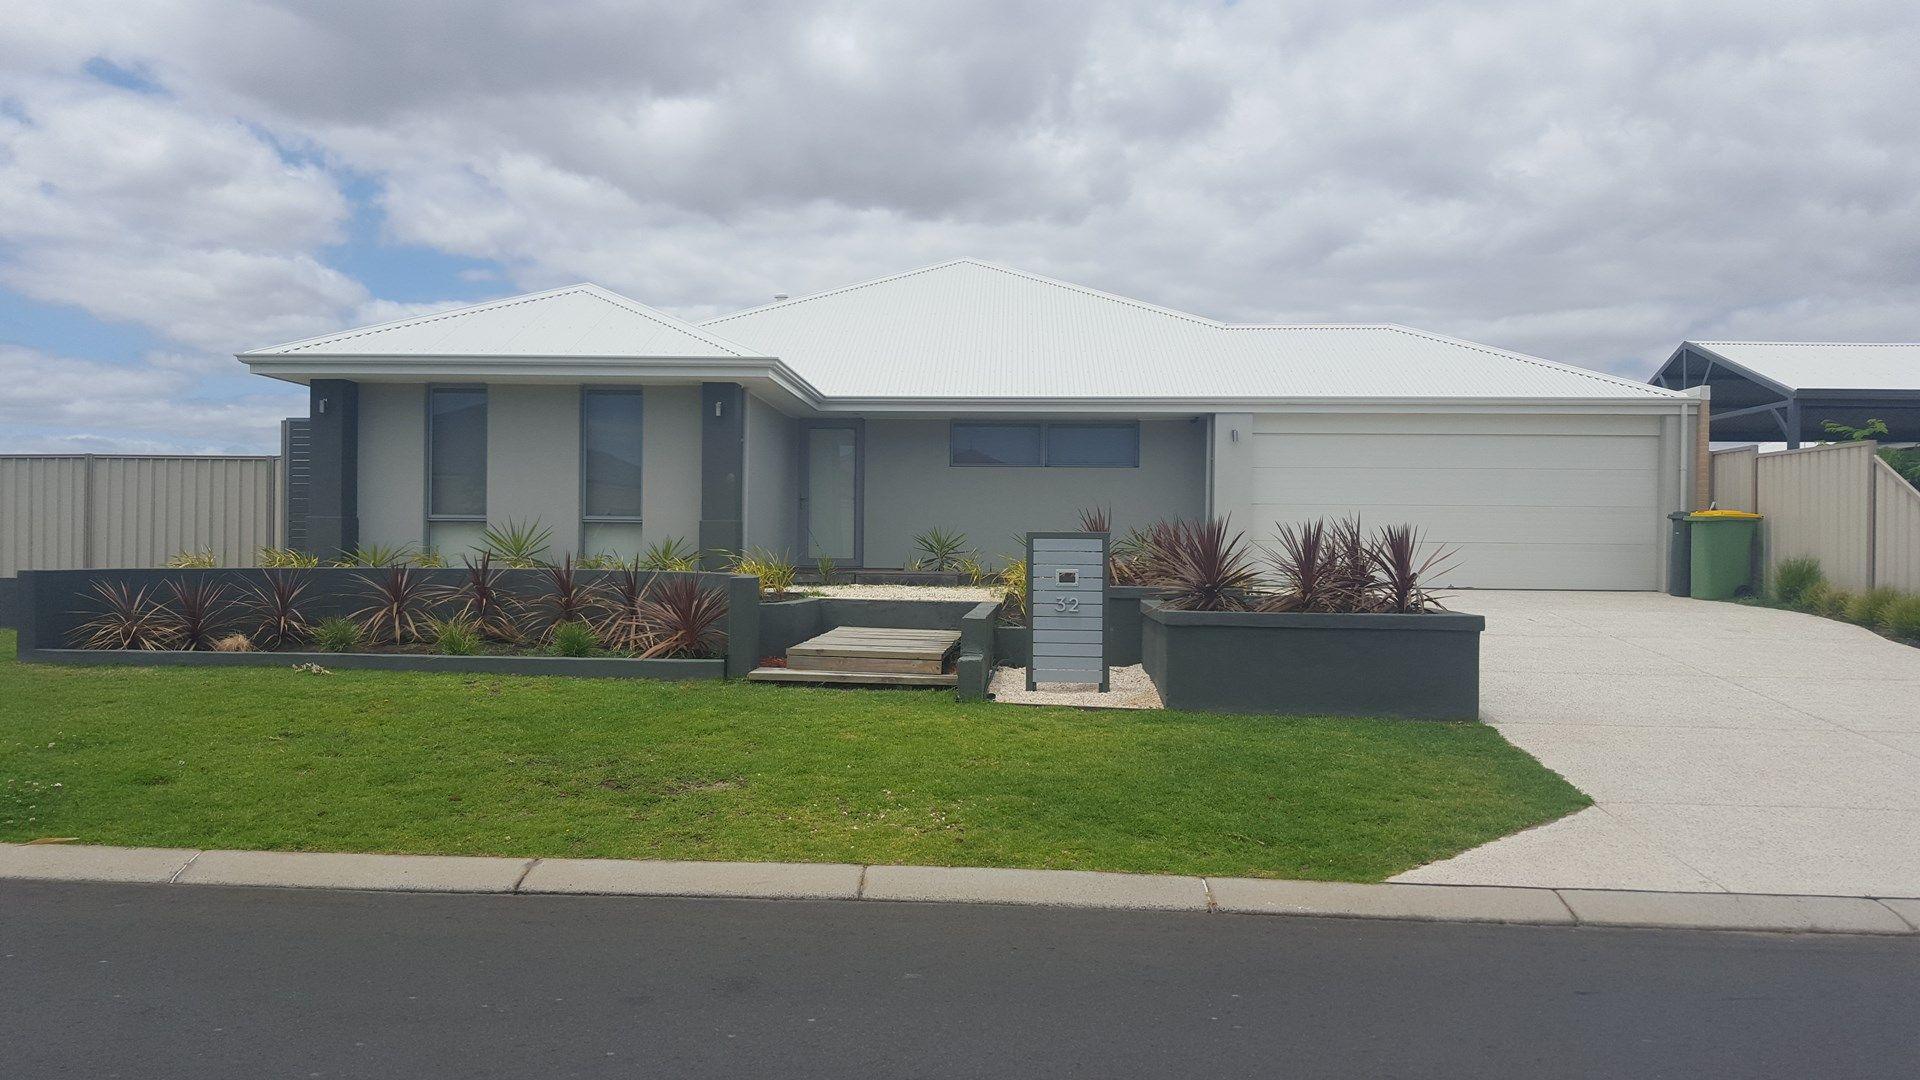 32 Denebola Drive, Australind WA 6233, Image 0